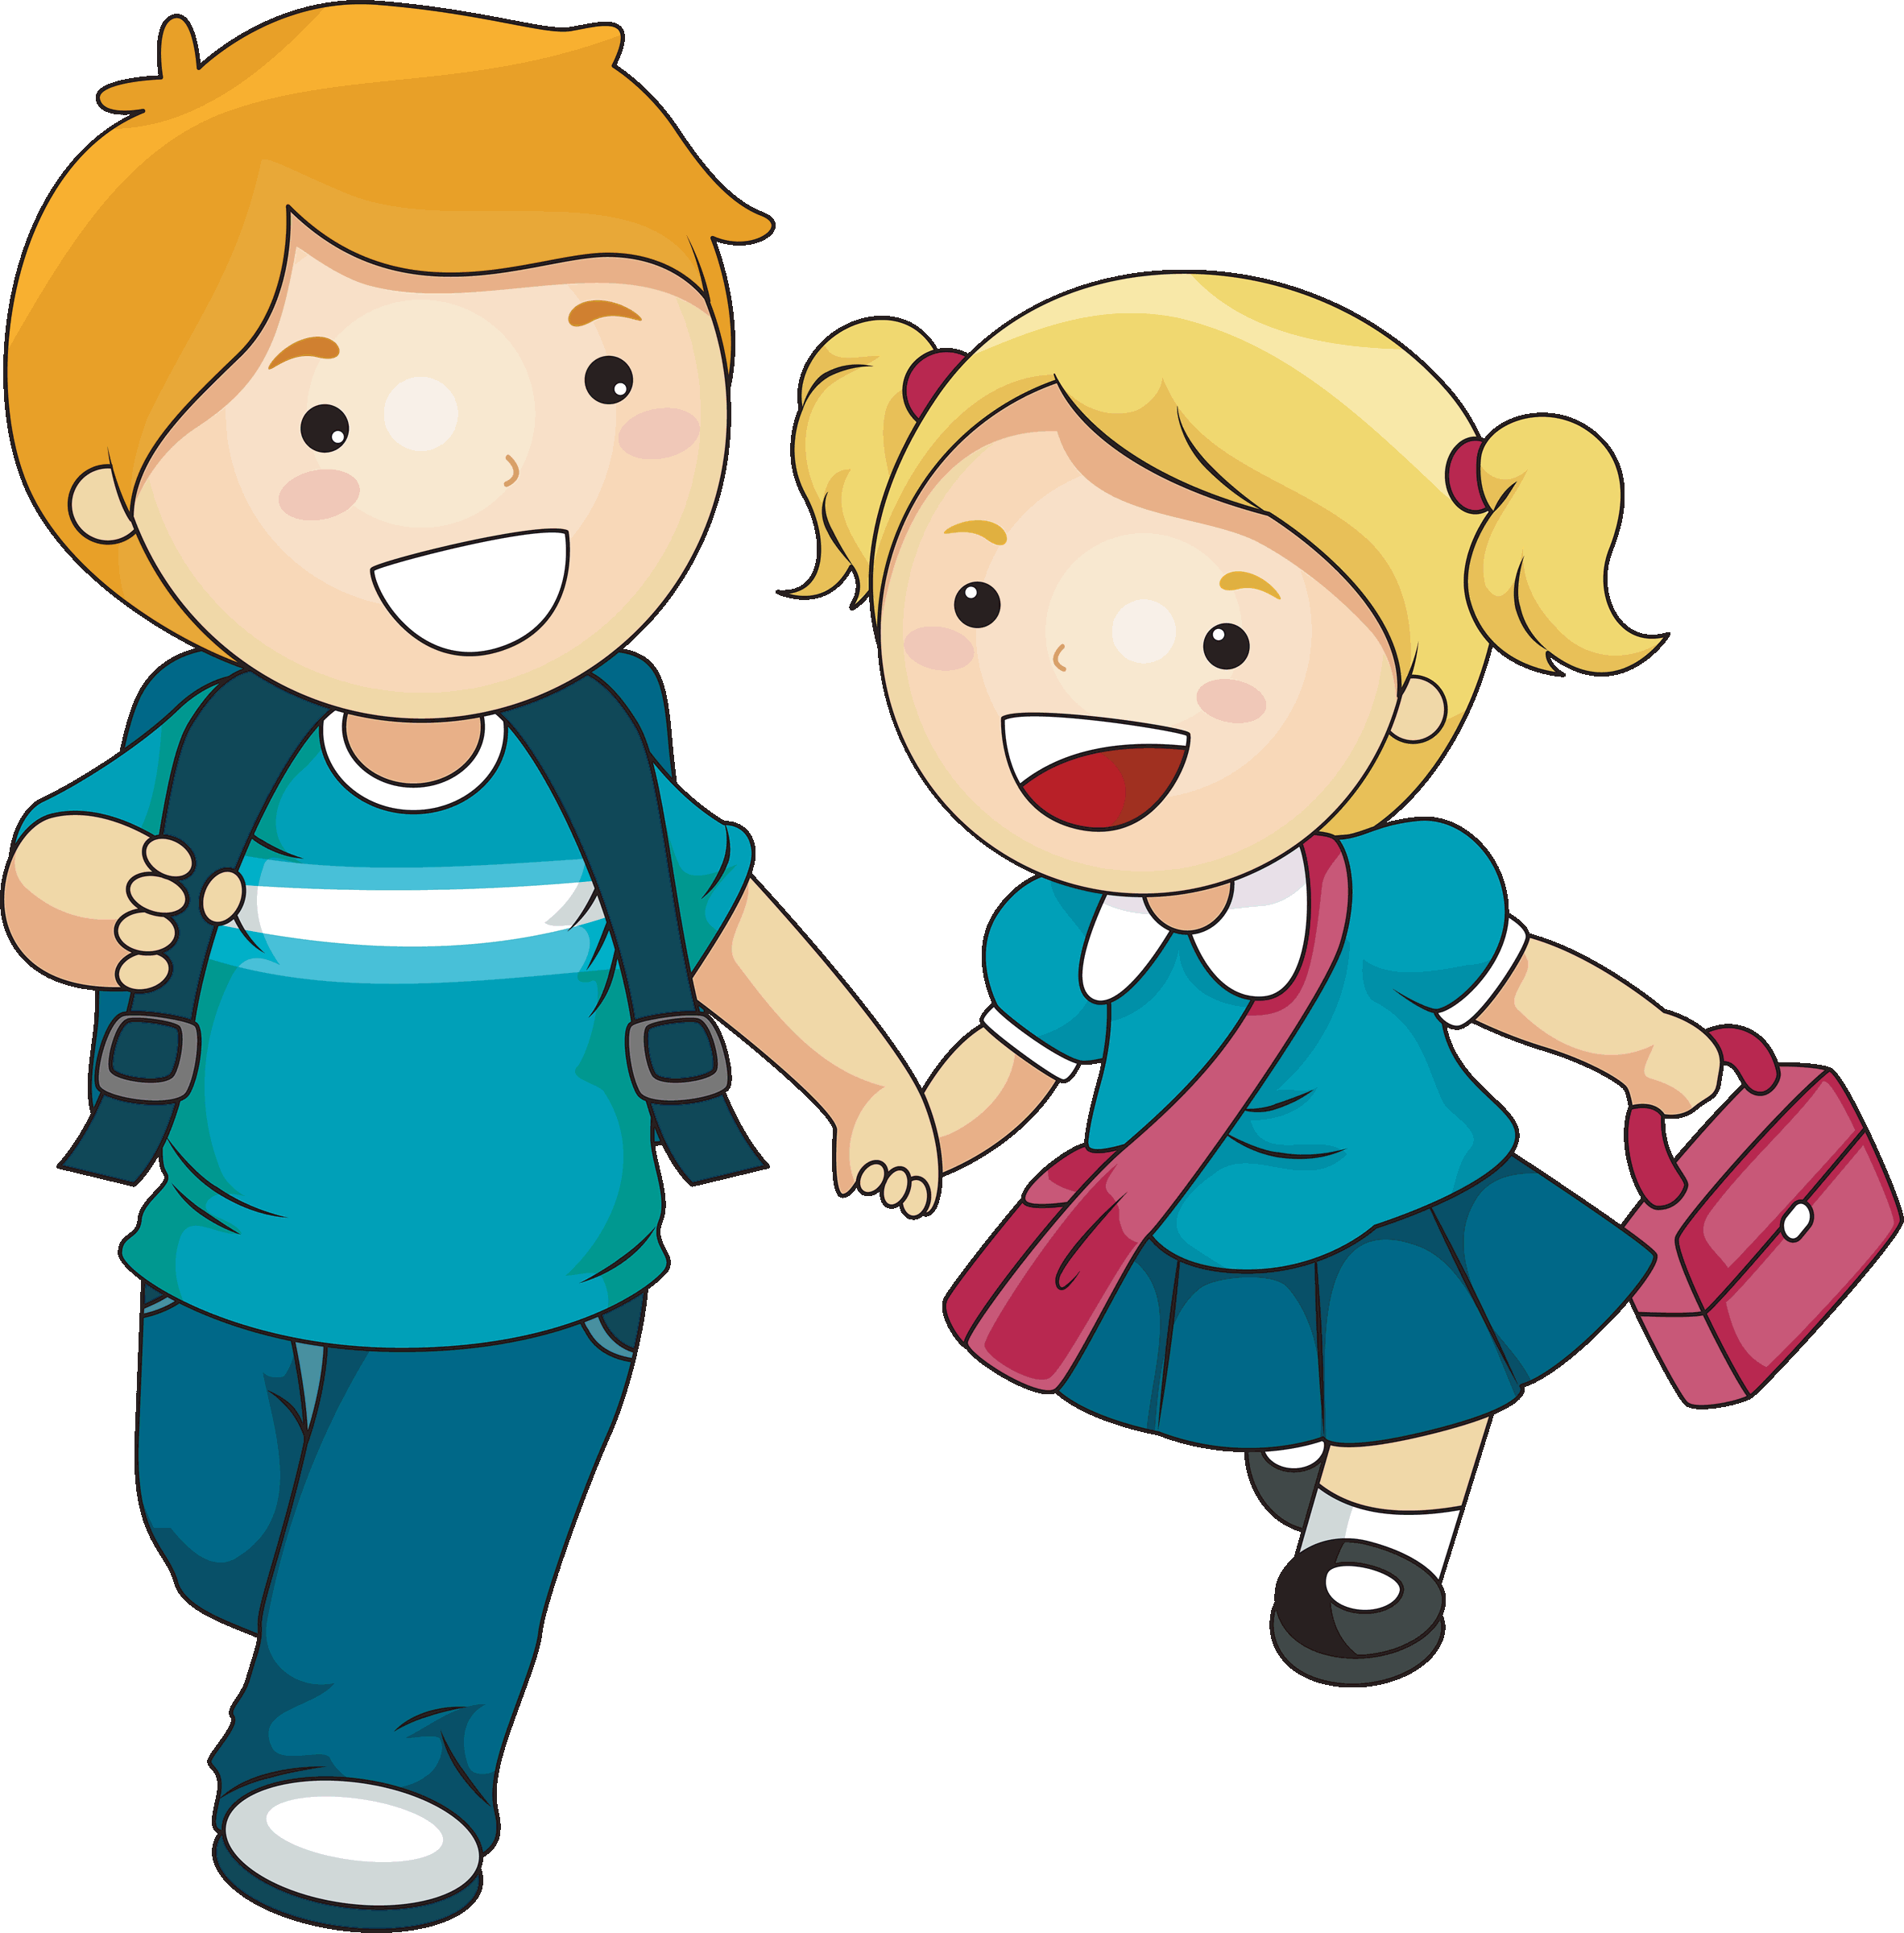 Free Download Dancing Children Clip Art Hd Wallpaper Car Pictures - Children  HD PNG - Kid In Bed PNG HD